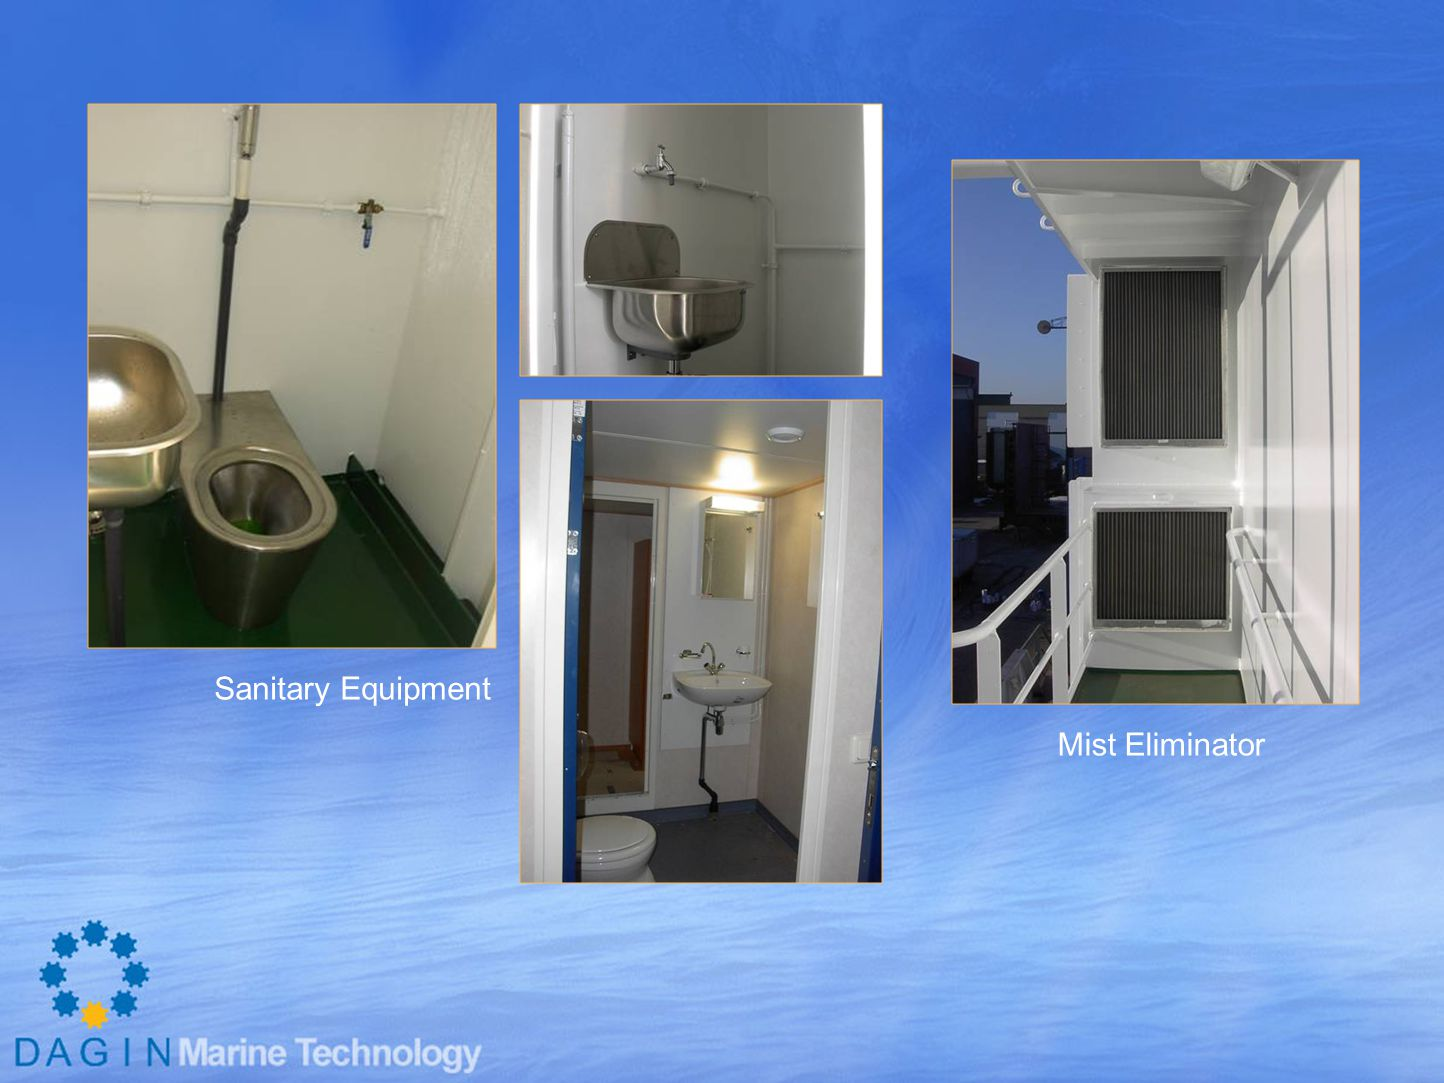 Sanitary Equipment Mist Eliminator